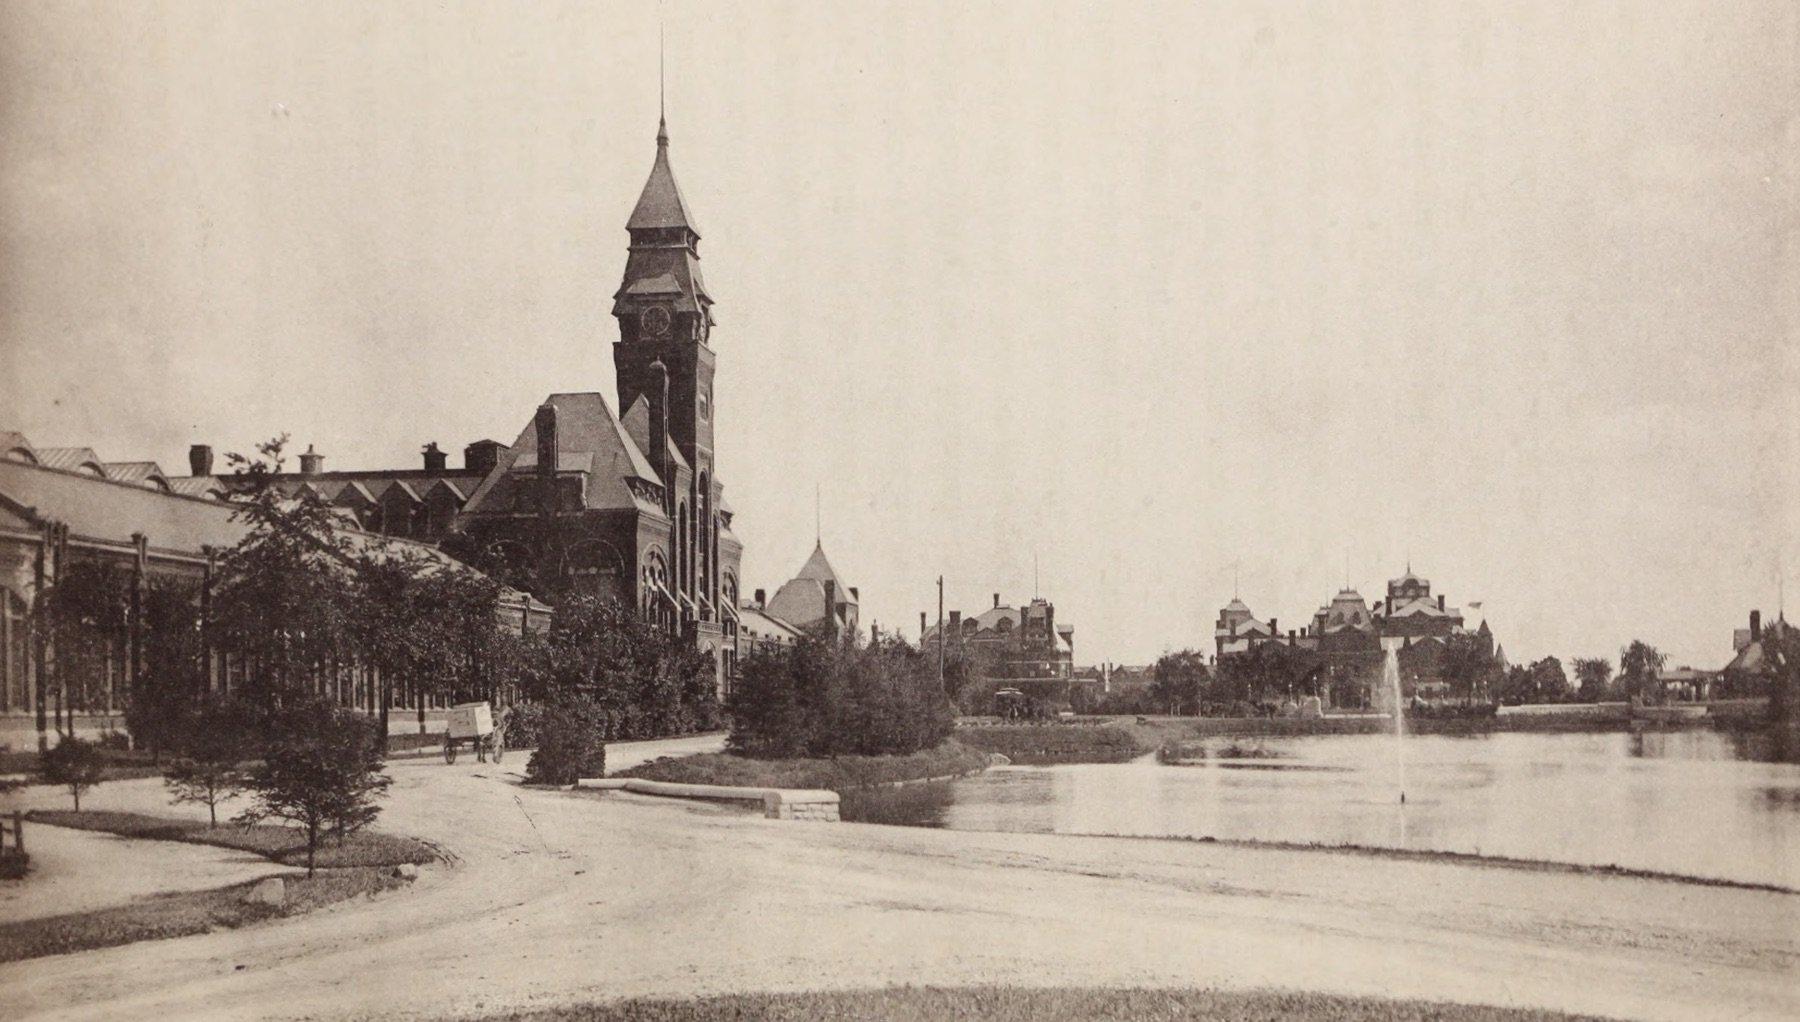 From @backwards_river: Pullman, 1893 https://t.co/giZMrikfzg